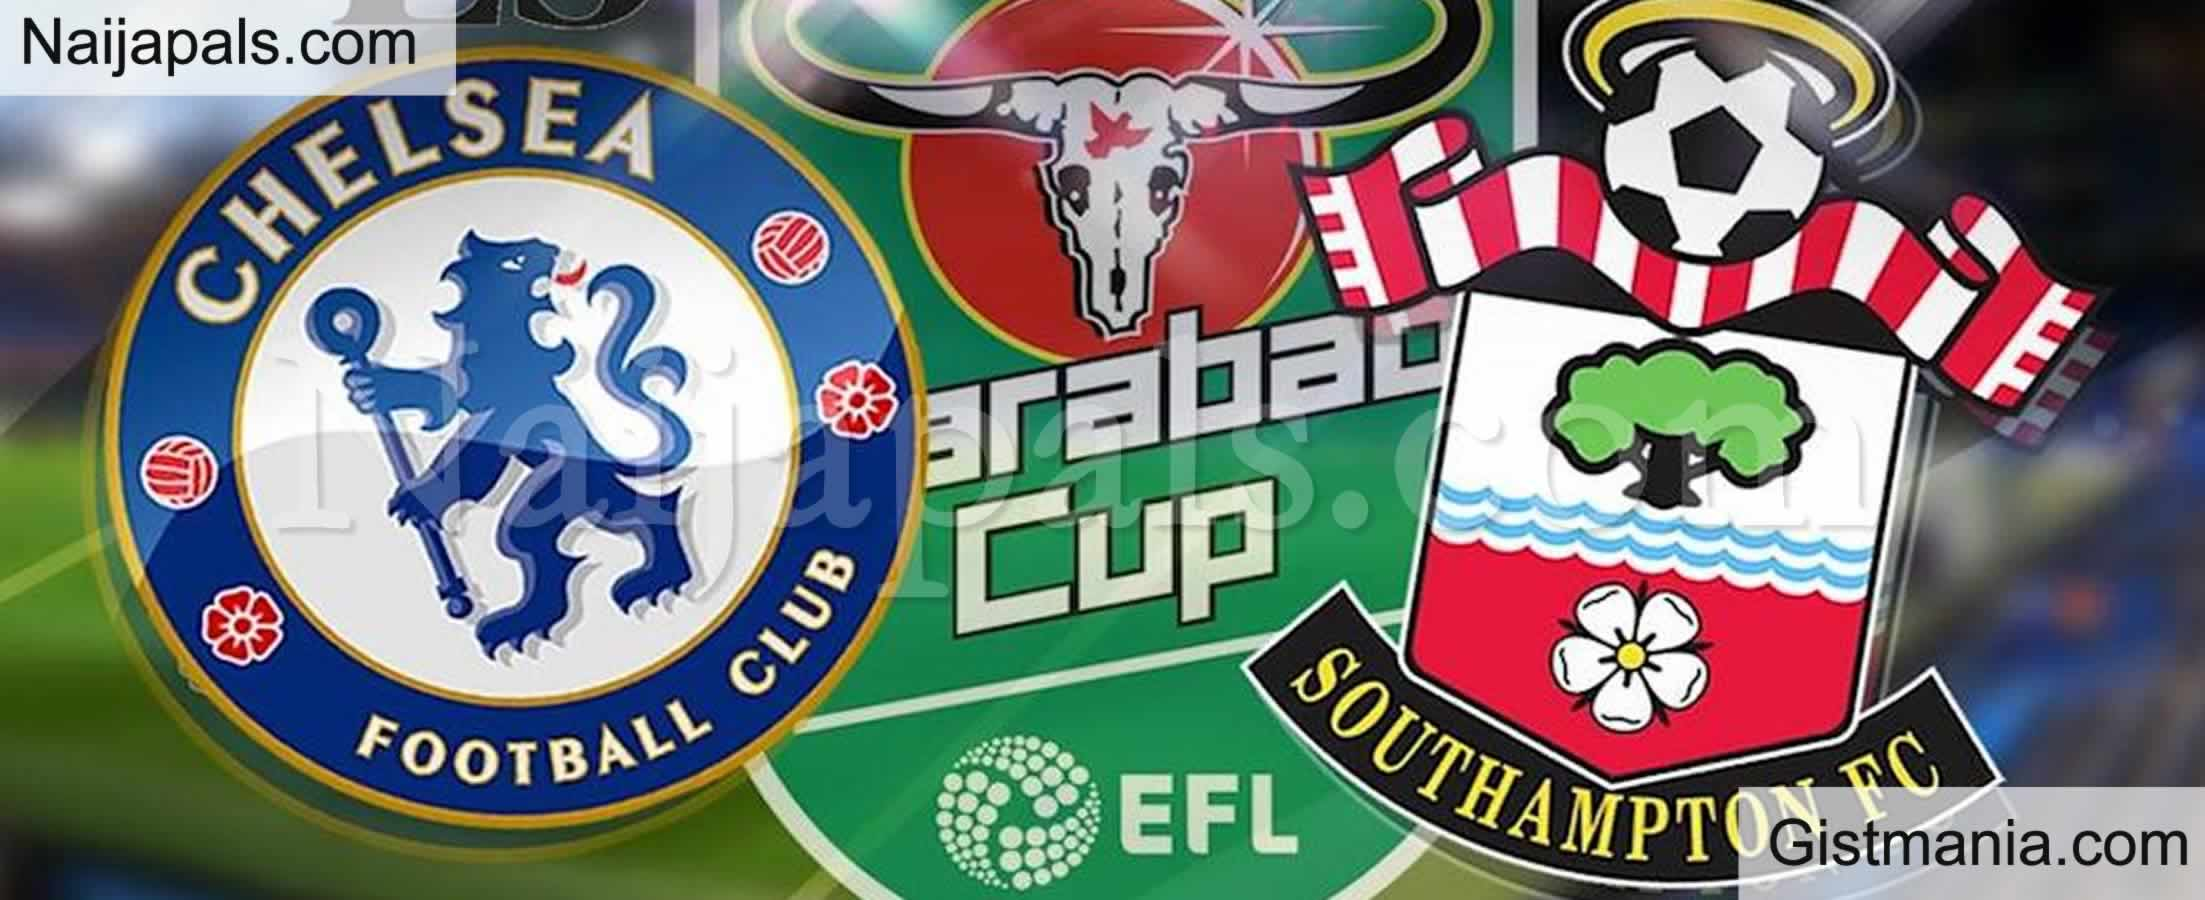 <img alt='.' class='lazyload' data-src='https://img.gistmania.com/emot/soccer.gif' /> <b>Chelsea vs Southampton : Carabao League Cup, Team News, Goal Scorers and Stats</b>